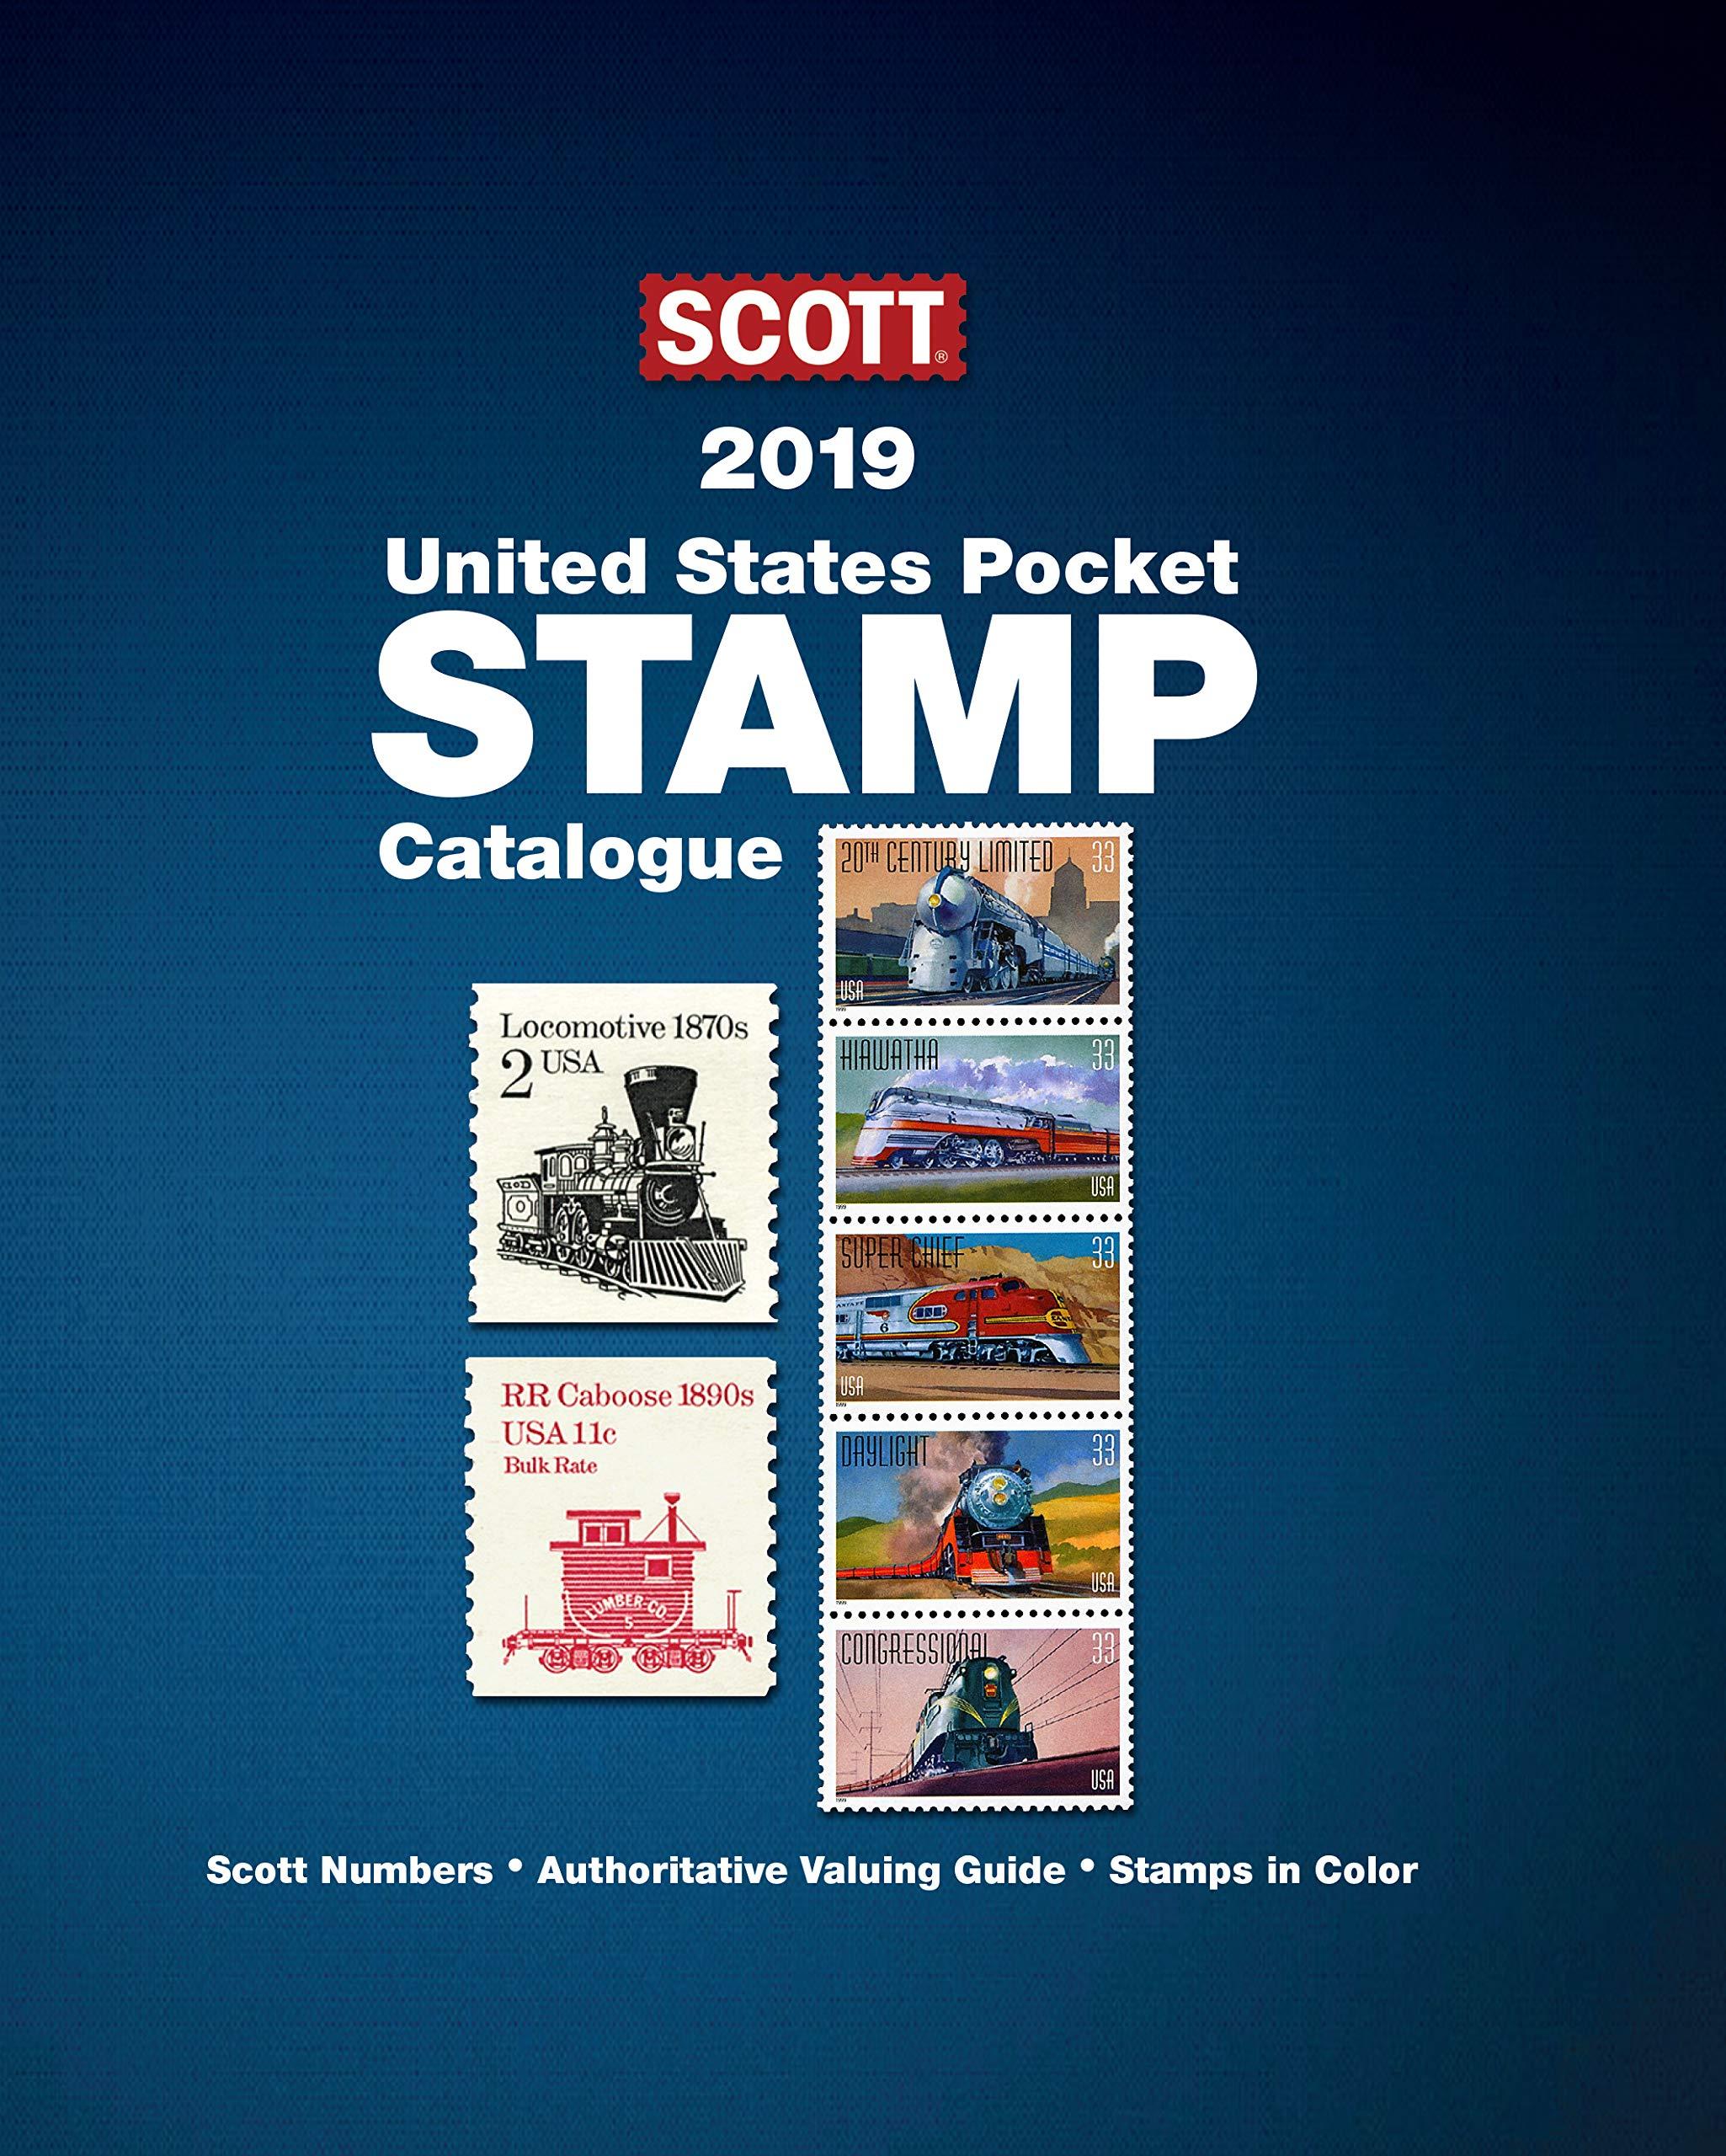 2019 Scott United States Pocket Stamp Catalogue (Scott Catalogues) by Amos Media Company (Image #1)